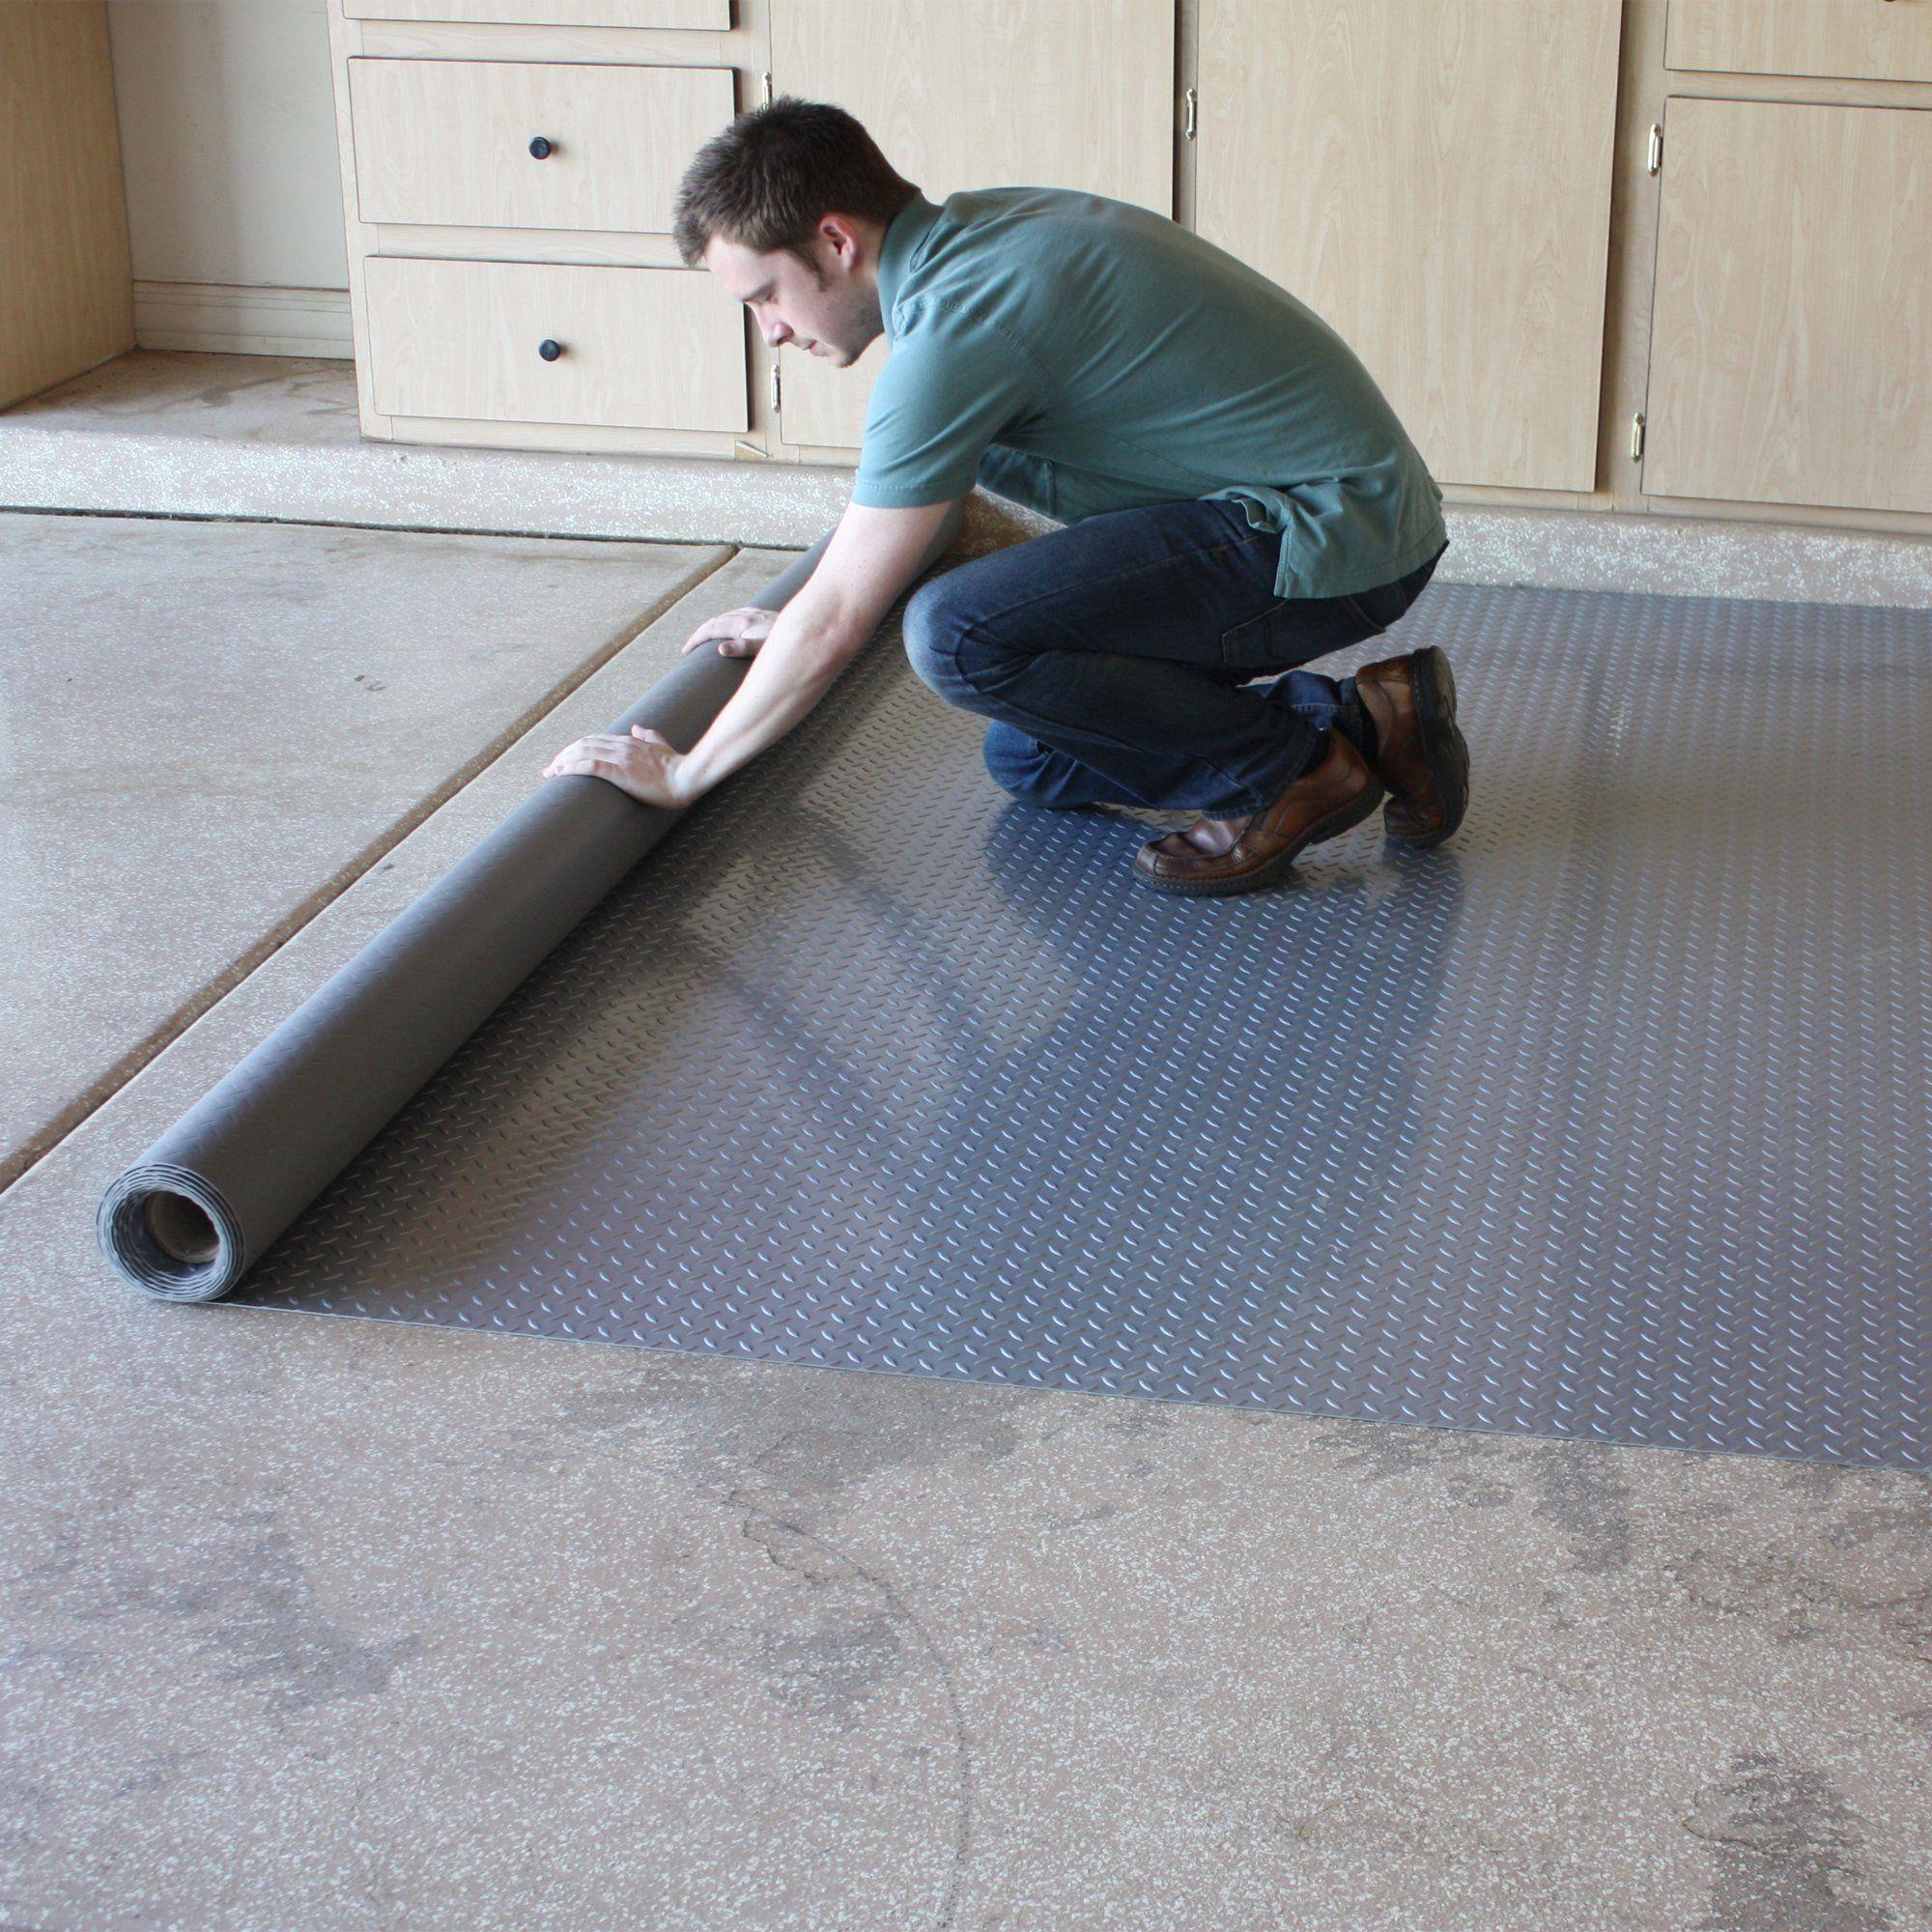 Flooringinc Diamond Nitro Rolls Standard Grade Stainless Steel 4 X4 Garage Flooring Roll Out Floor Protect In 2020 Garage Floor Garage Floor Epoxy Garage Floors Diy